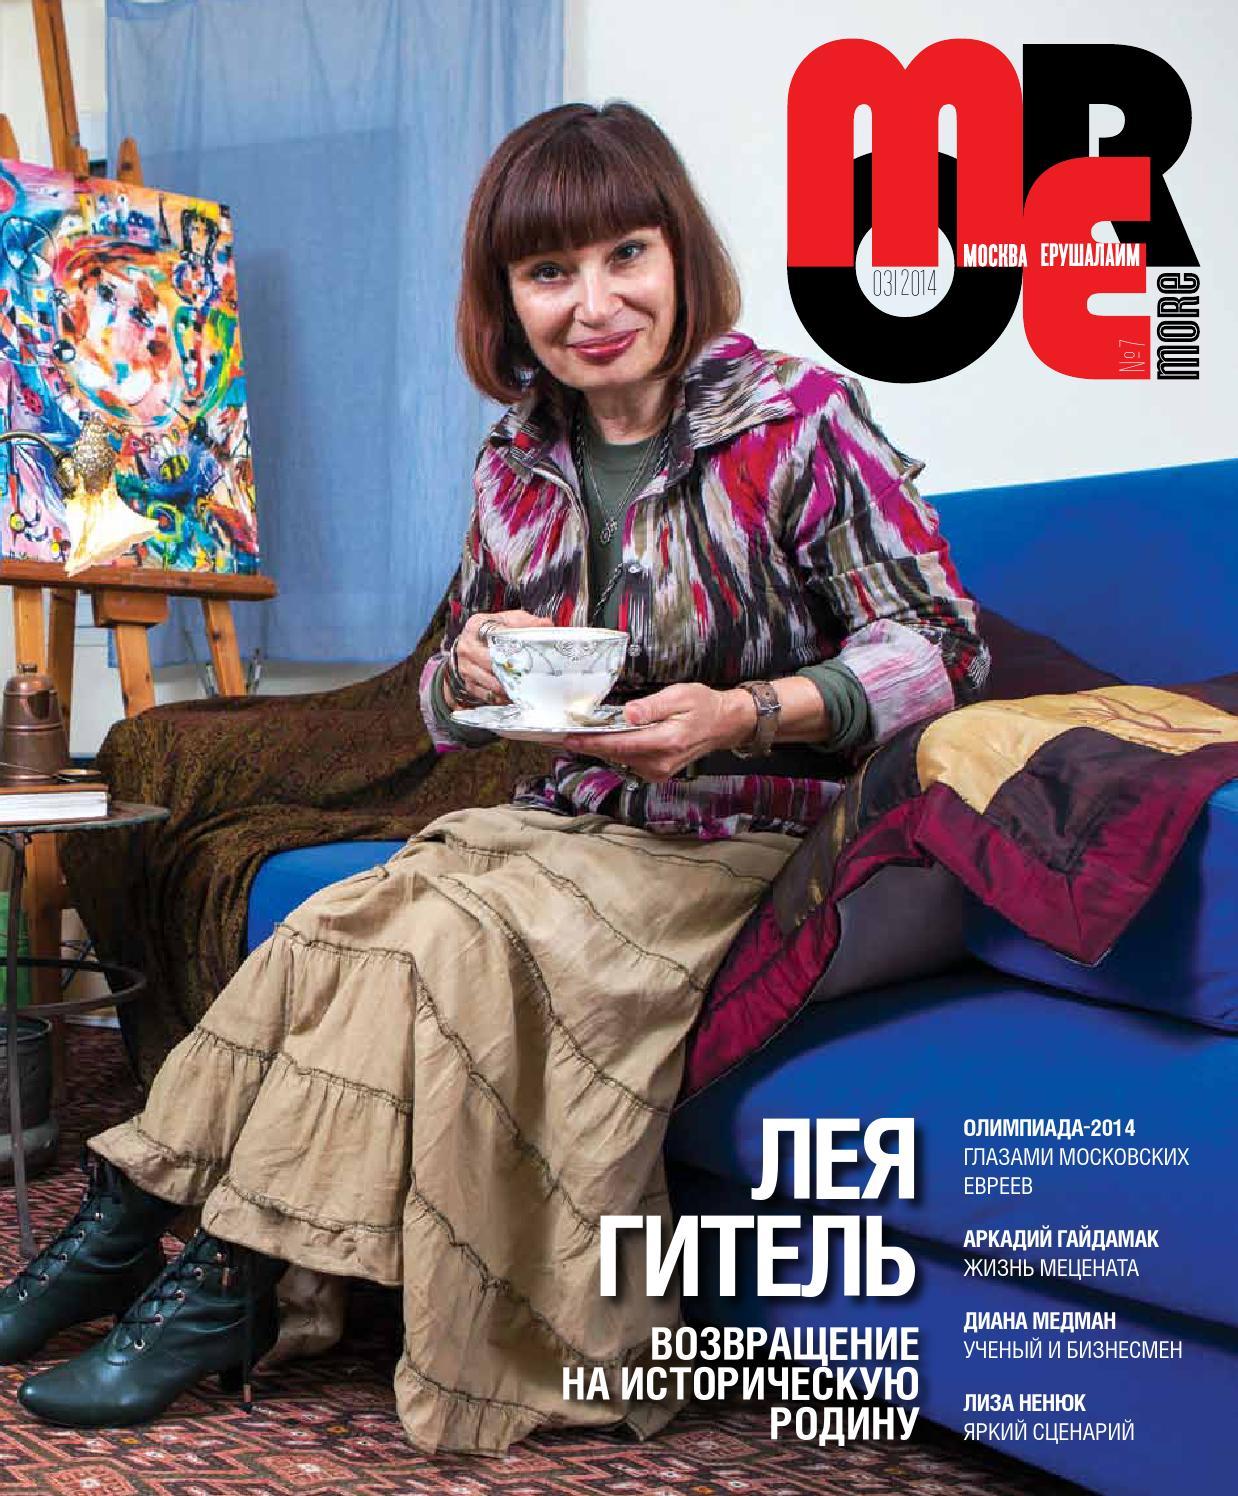 гурский александр 56 лет баку одноклассники фото